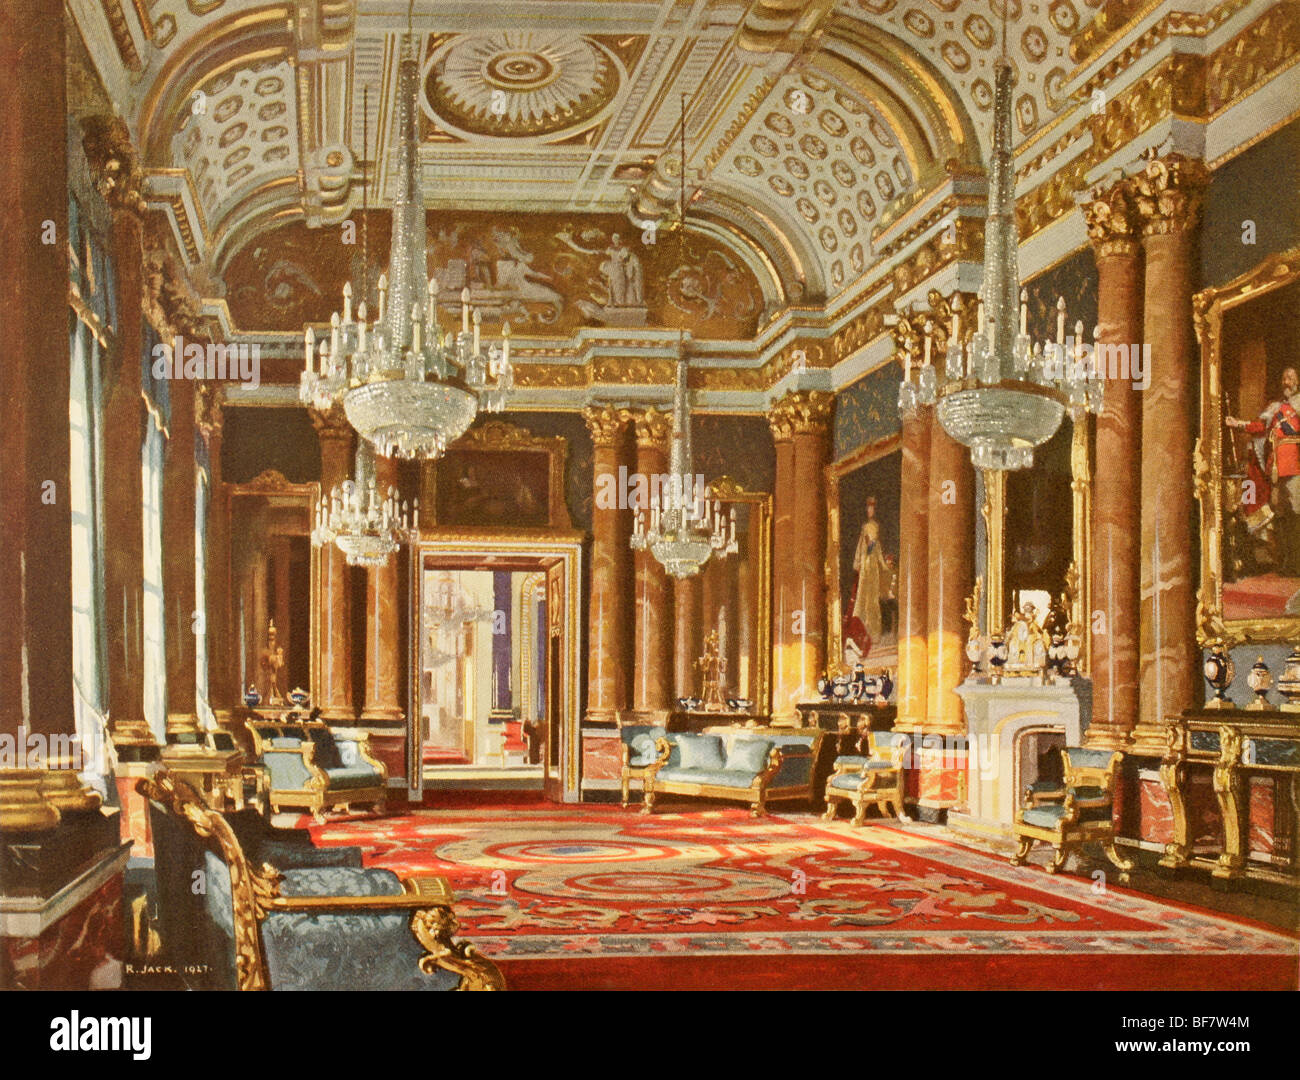 Throne room buckingham palace - The Blue Drawing Room Formerly The Ballroom In Buckingham Palace London England